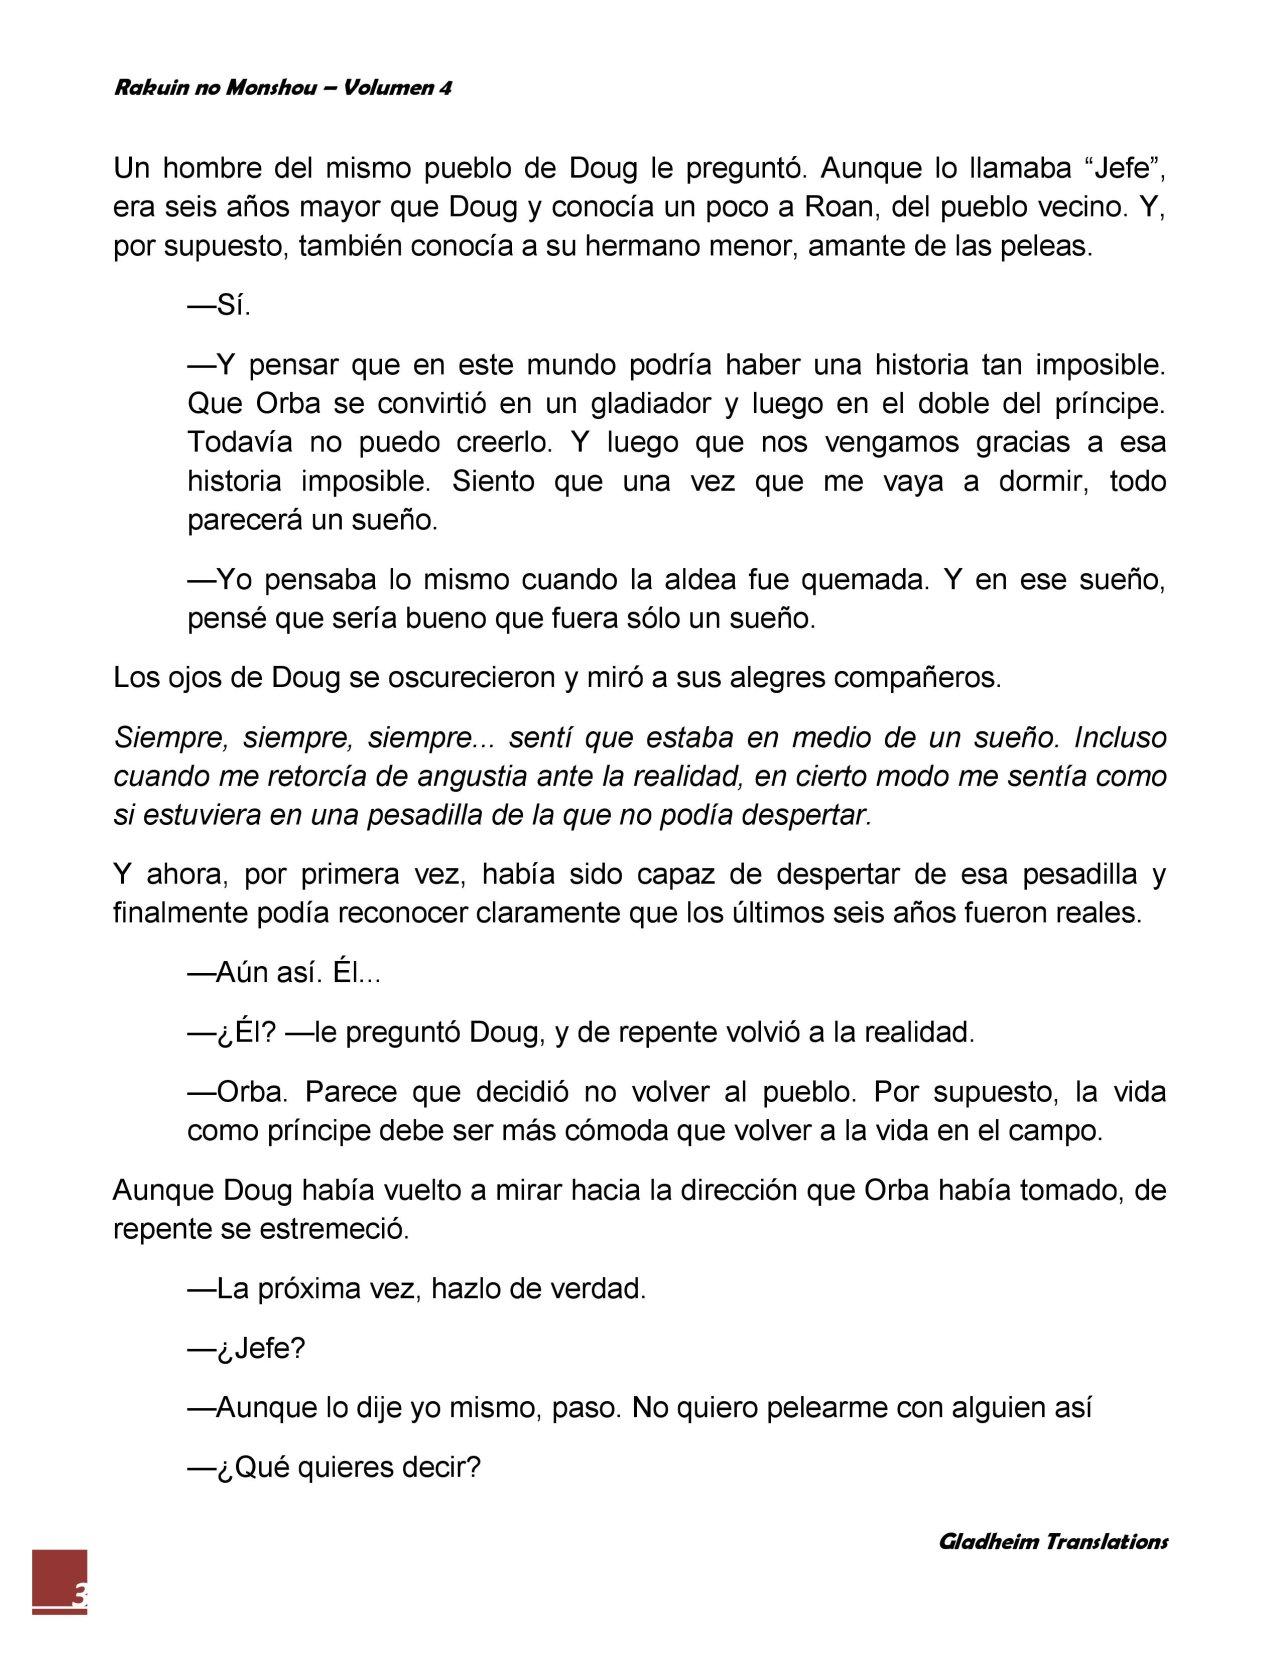 https://c10.mangatag.com/es_manga/pic5/22/25558/782960/1841038227852628f1d604c0211494a6.jpg Page 3